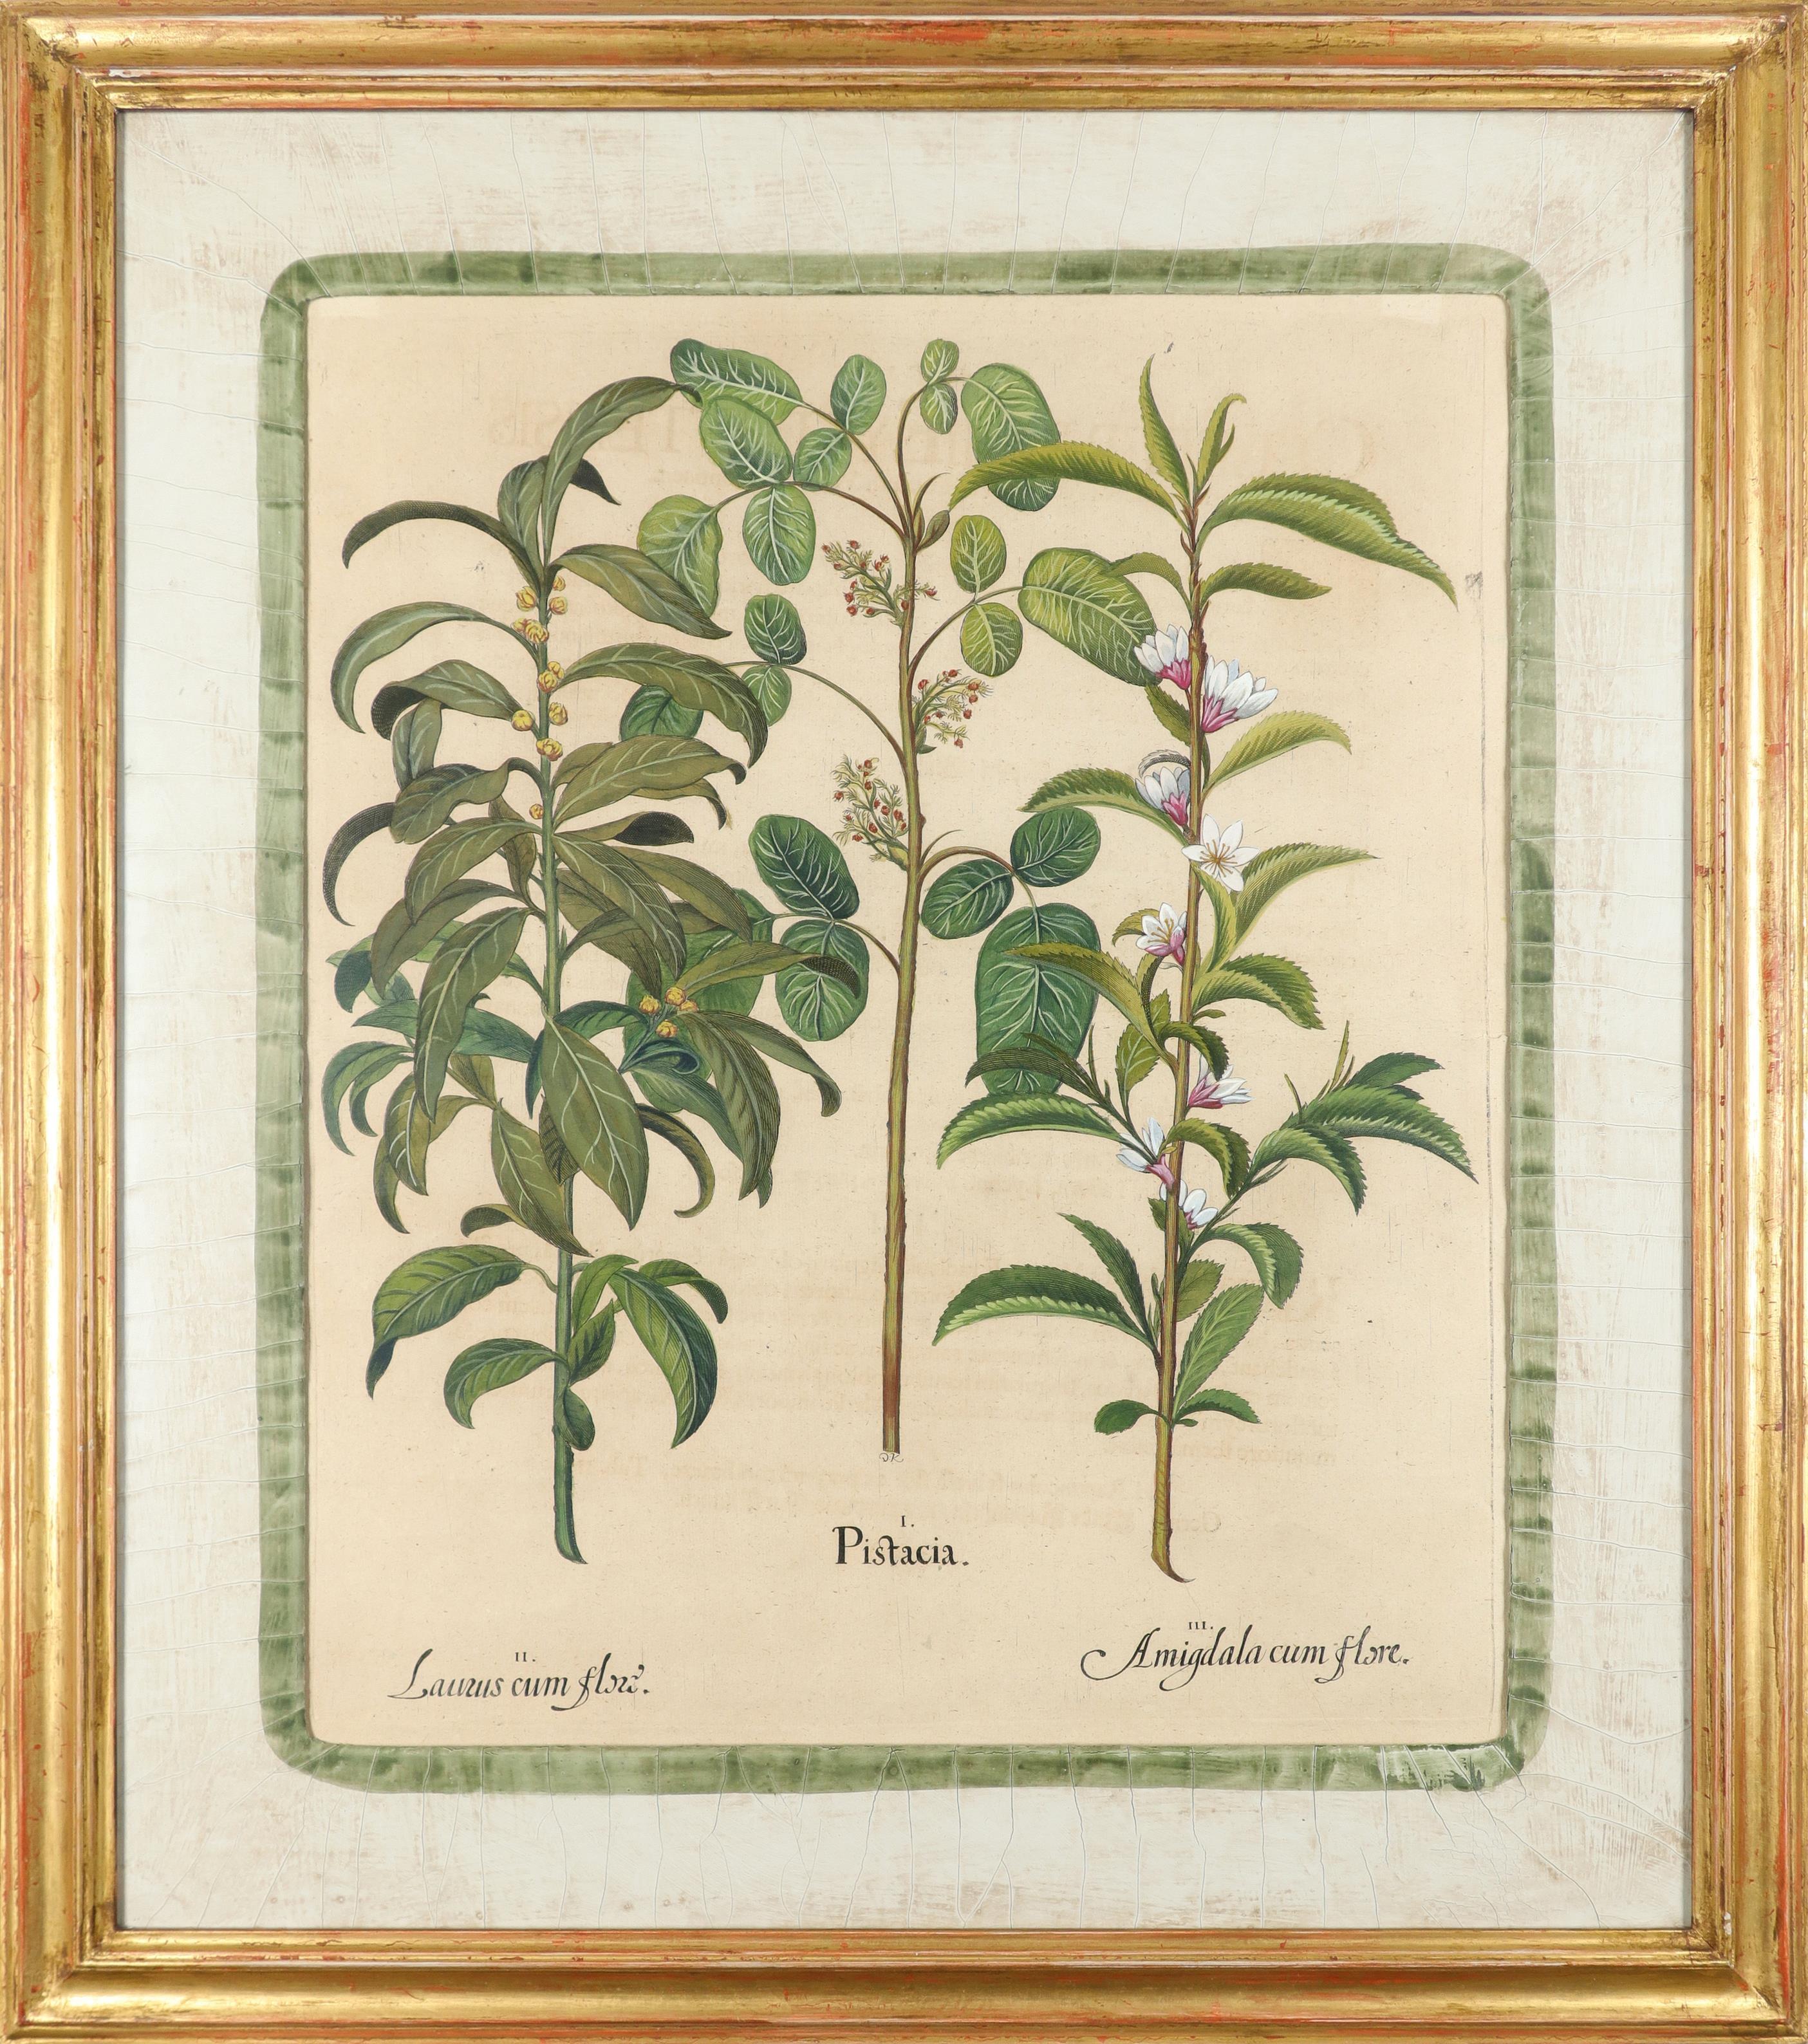 After Basilius Besler Poma flore multiplici; Aquilegia stellata flore vio laceo; Cytisus - Image 32 of 36